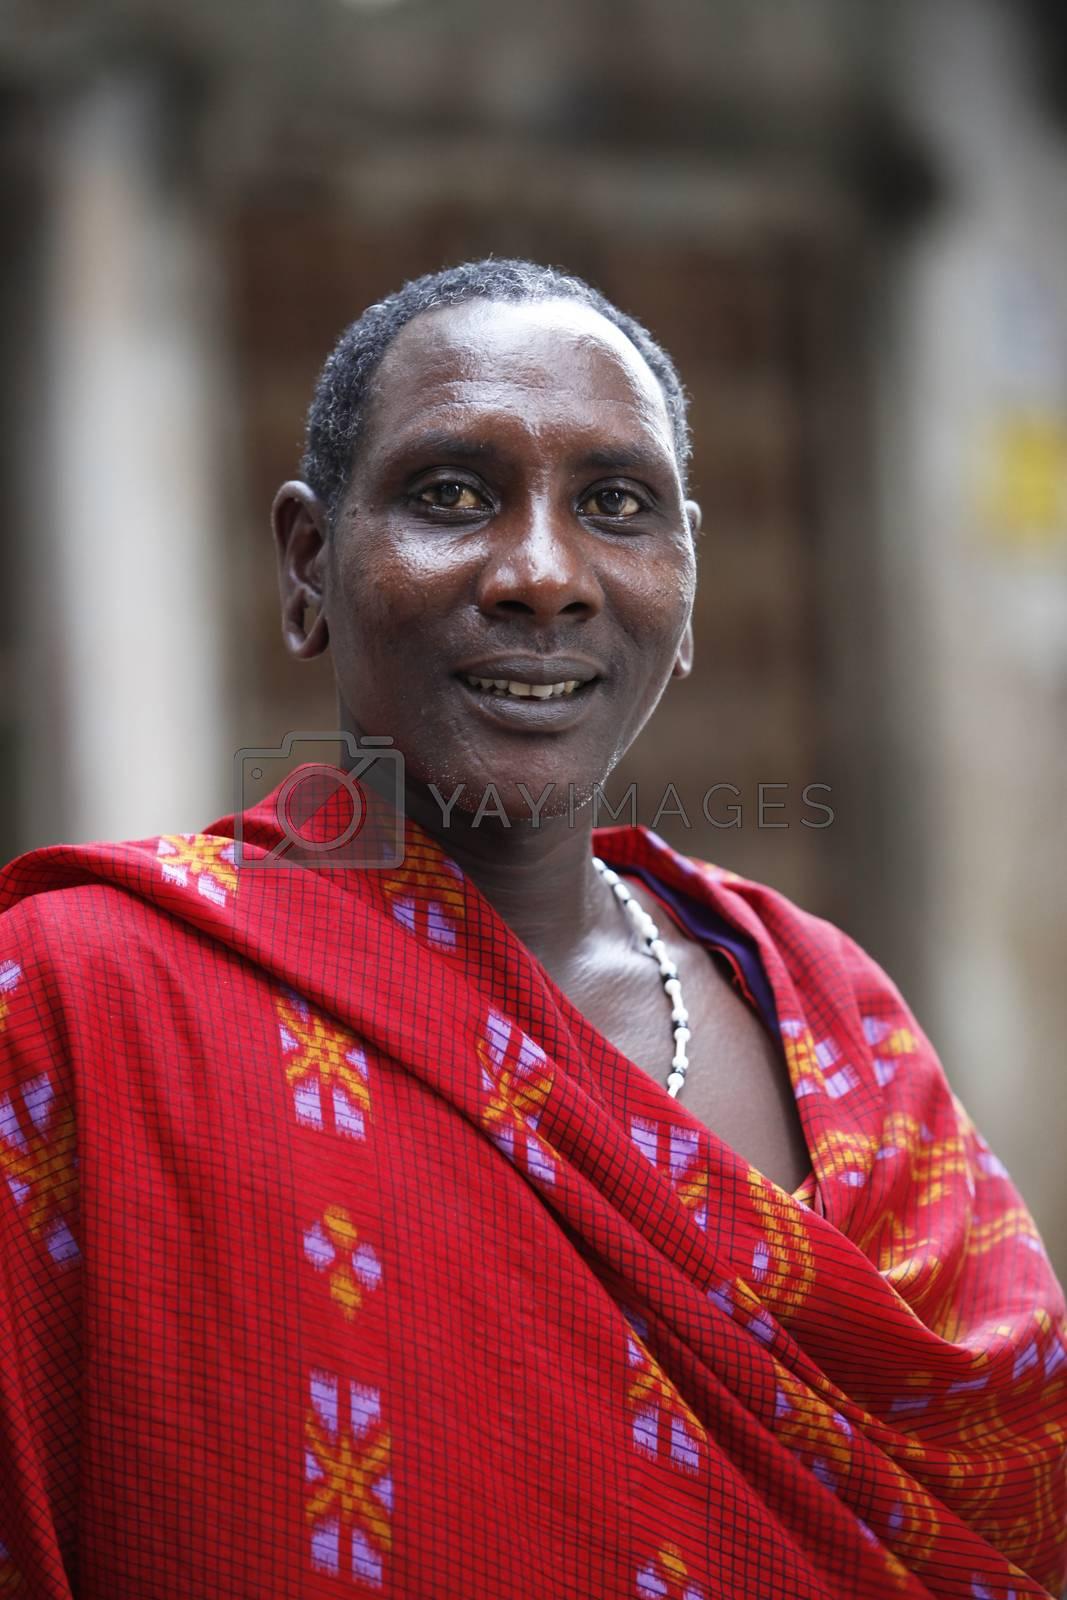 Stoun Town, Zanzibar - January 10, 2016: The Maasai are a Nilotic ethnic group of semi-nomadic people inhabiting southern Kenya and northern Tanzania.